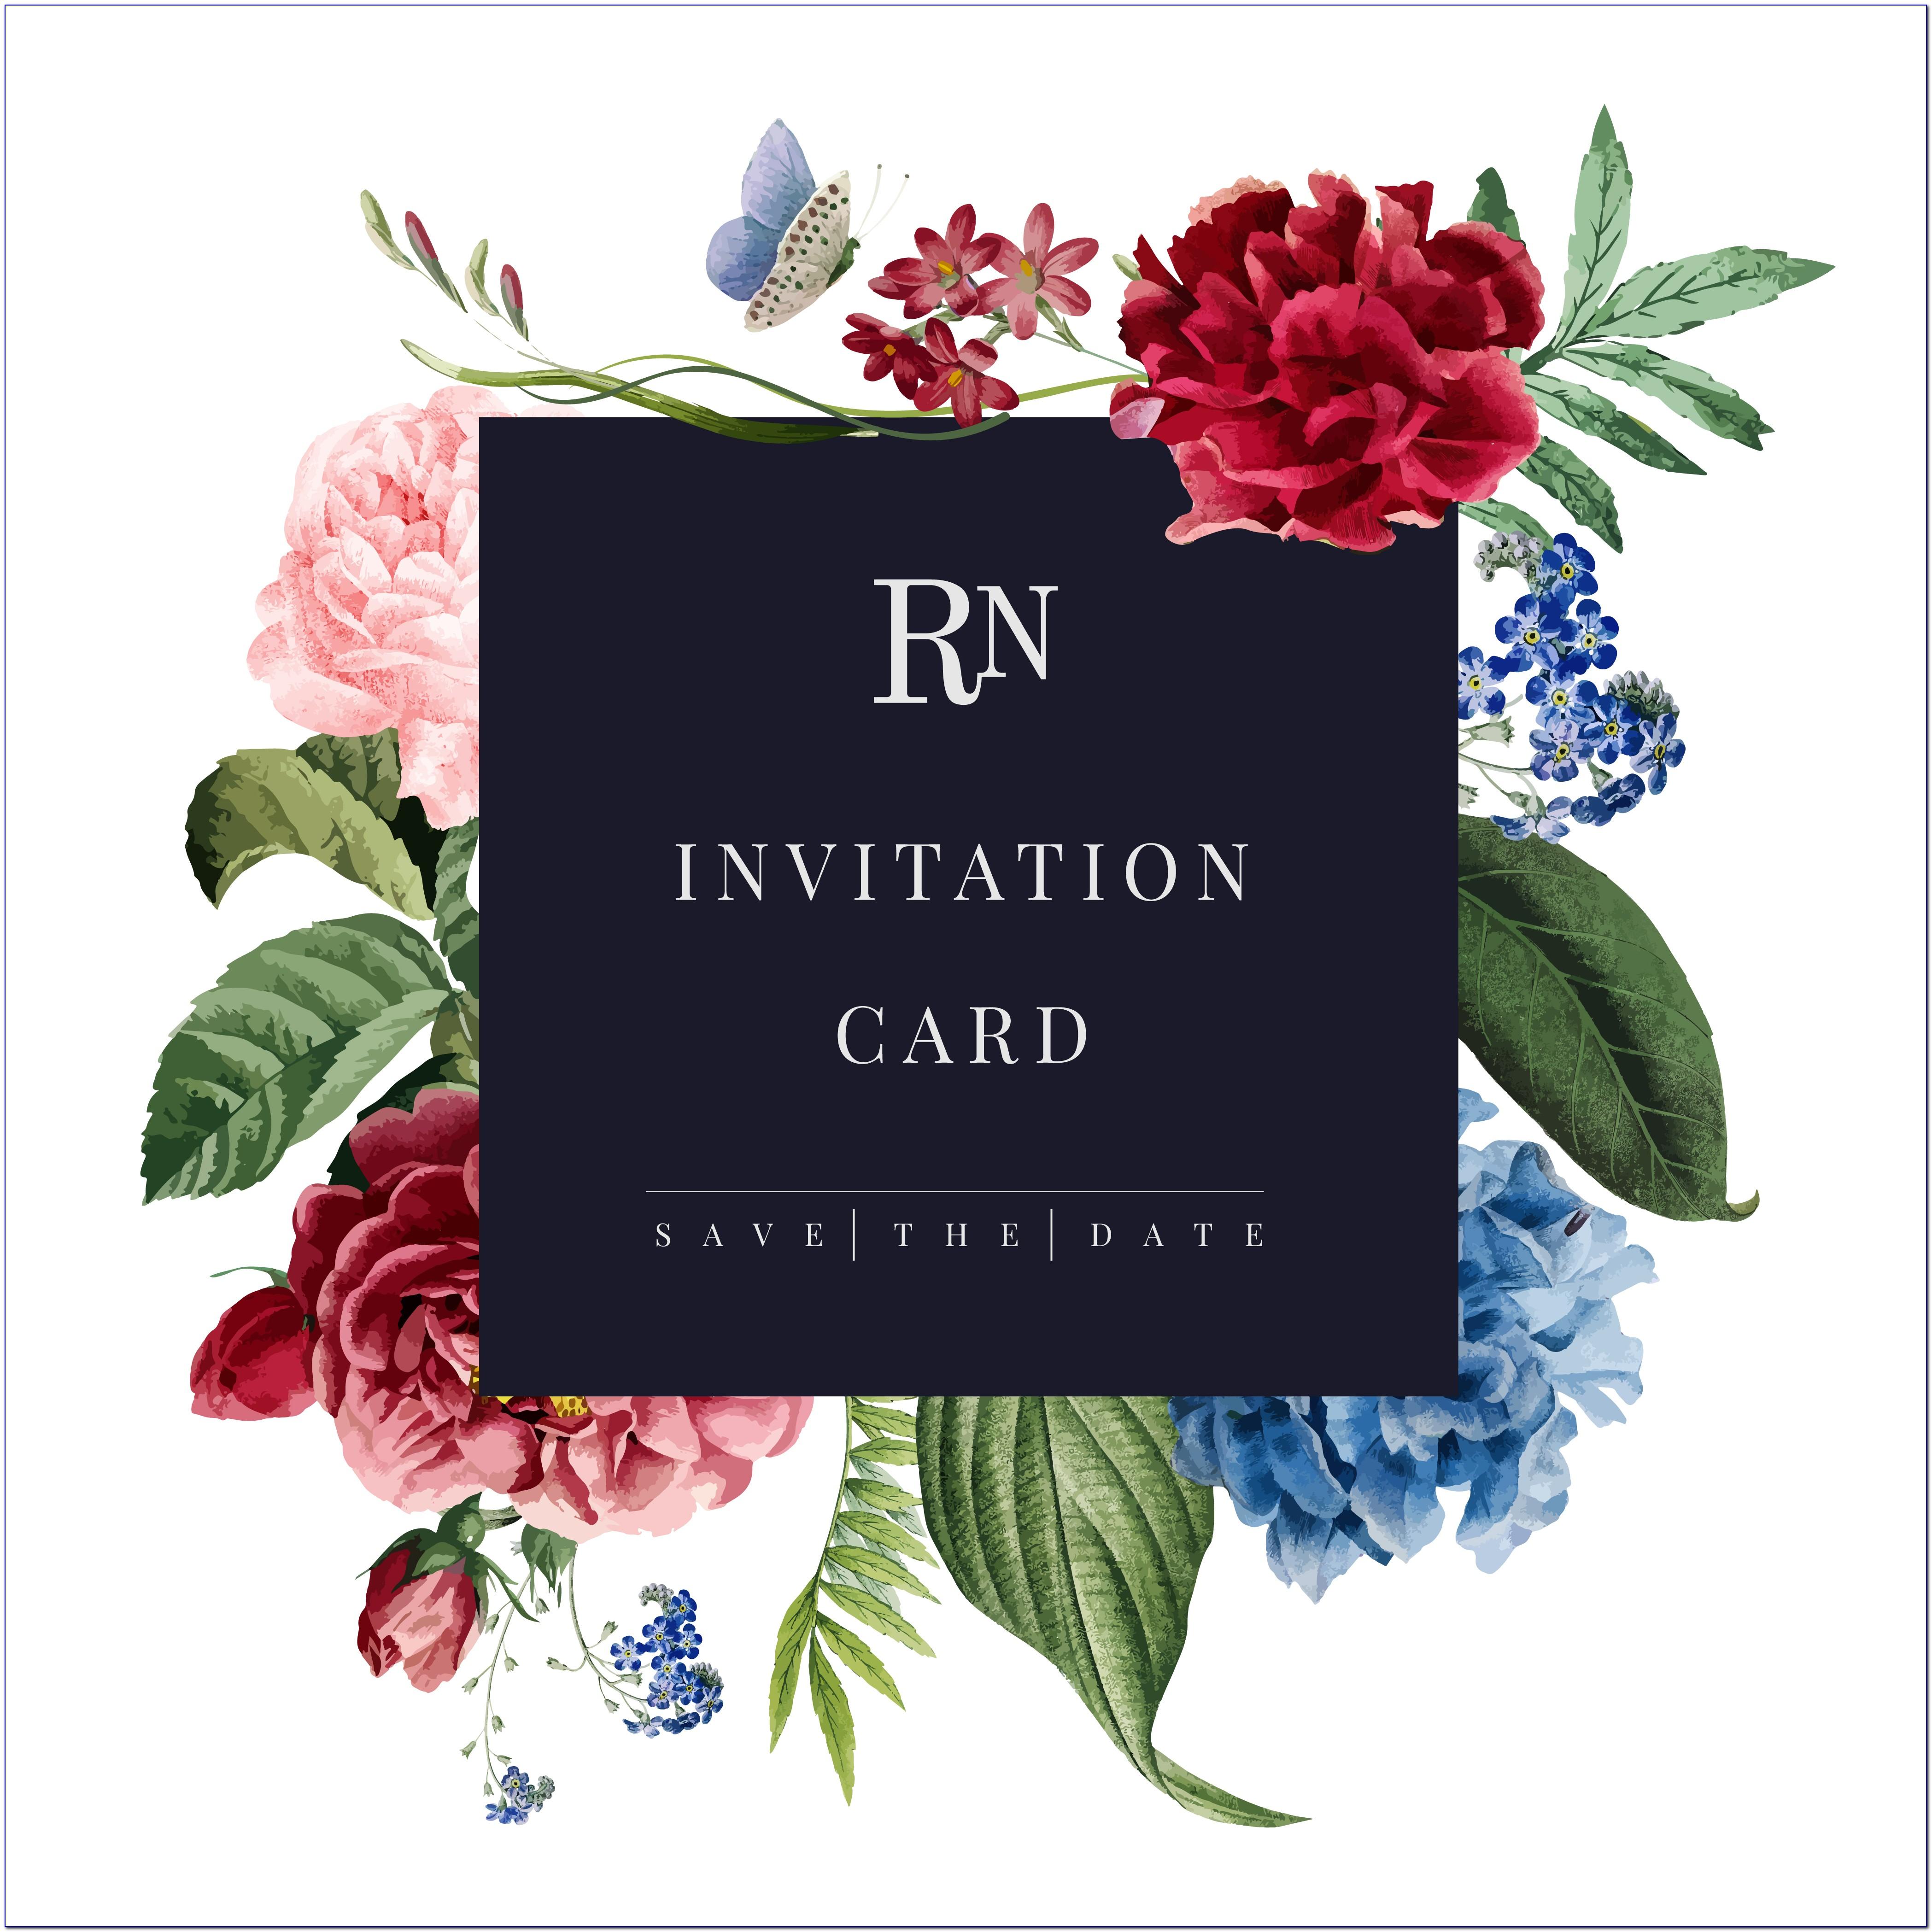 Floral Invitation Card Background